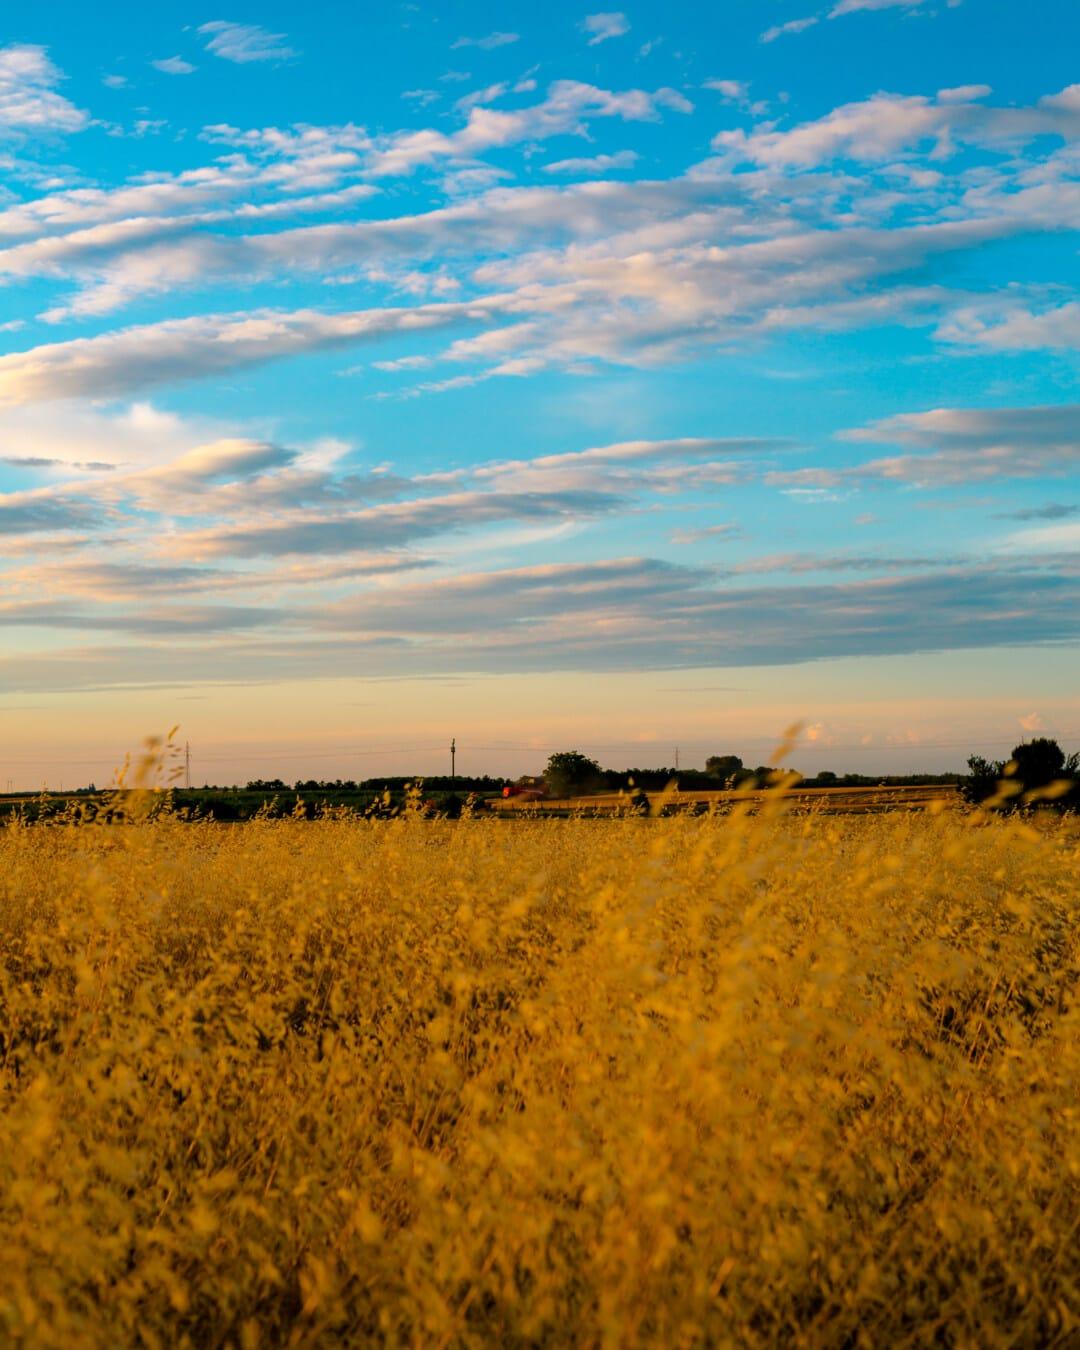 grass, high, yellow leaves, grassland, grassy, rural, field, landscape, seed, sunset